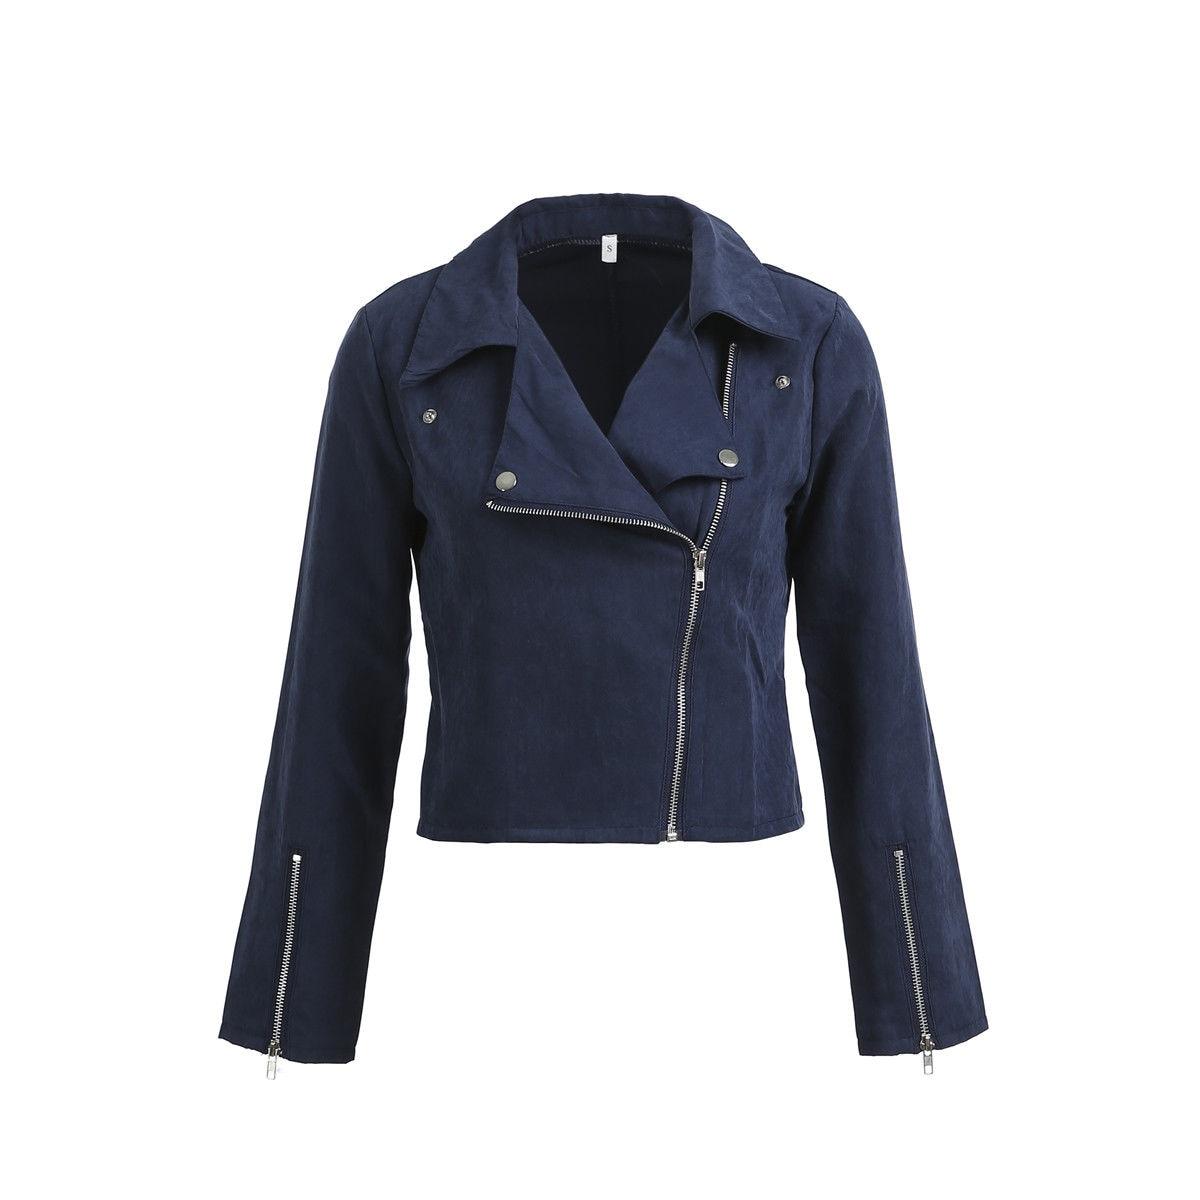 Fashion Women's Zipper Tunic Army Jacket Coats Casual Ladies Autumn Leather Jackets Zip Up Biker Coats Flight Tops Clothes New